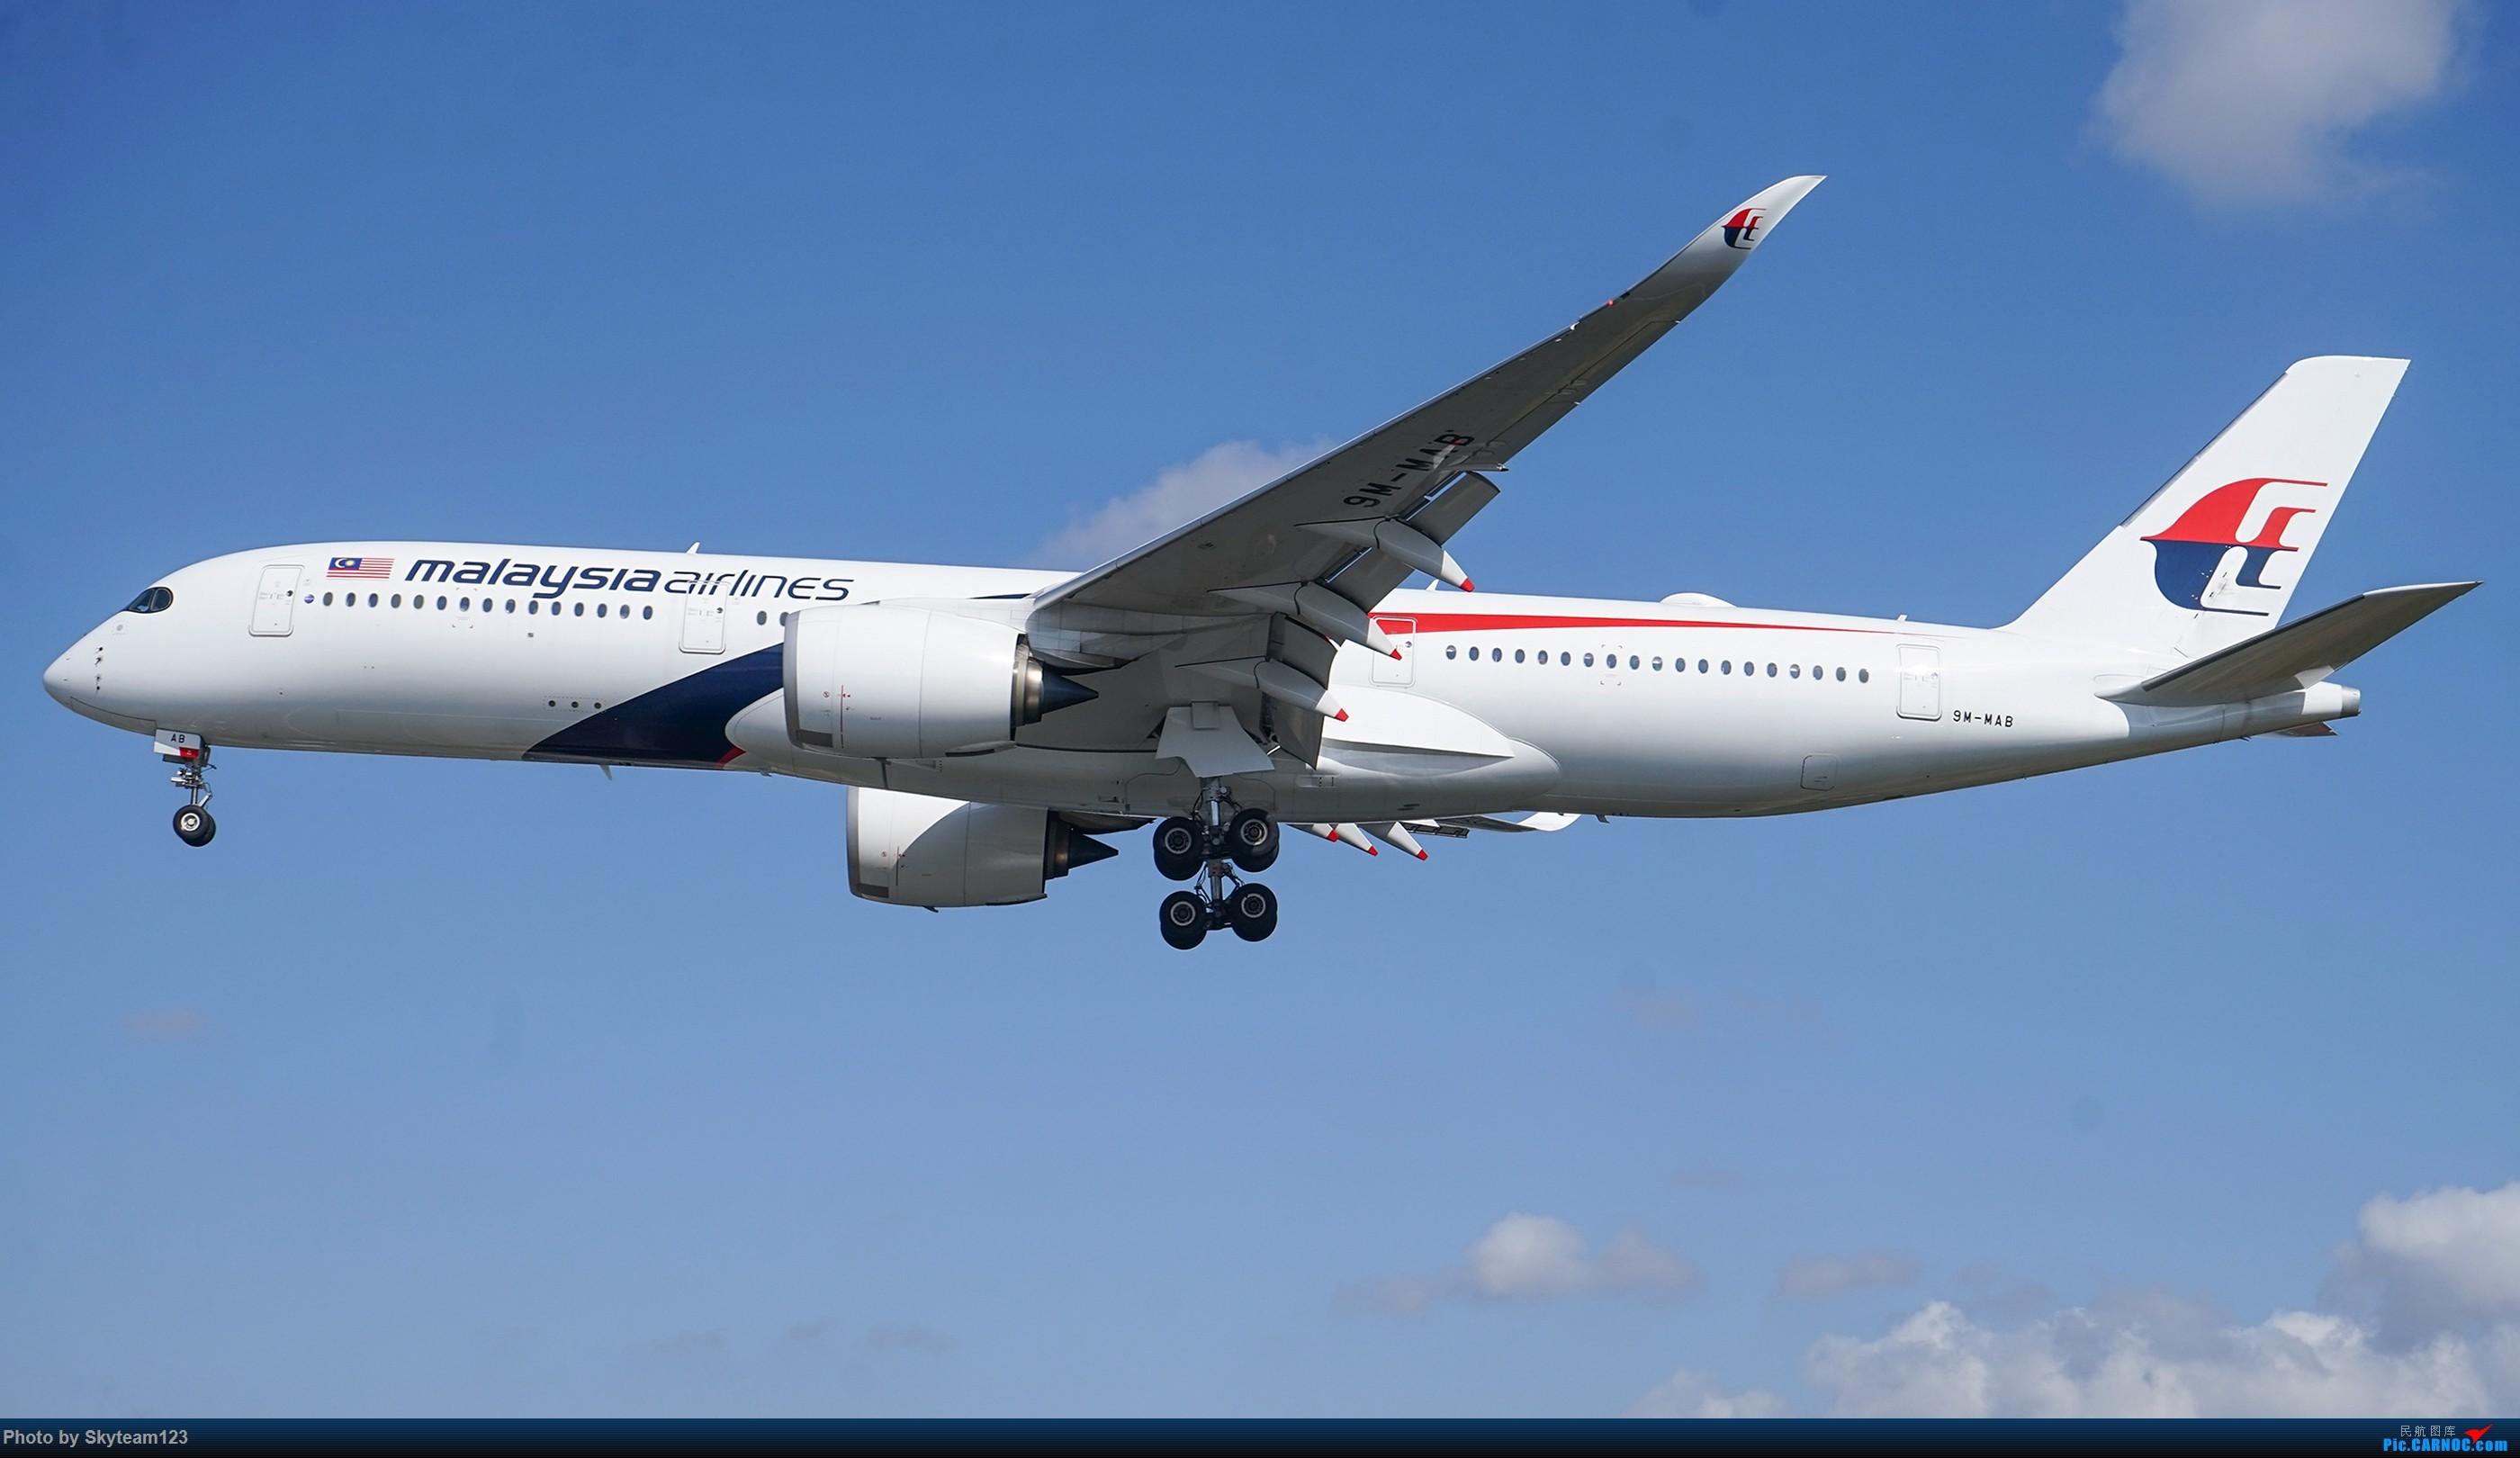 Re:[原创][SYD] 假期拍机小结 解锁16R跑道头拍机位 & 停车楼拍机作业 【全宽体】 AIRBUS A350-900 9M-MAB 澳大利亚悉尼金斯福德·史密斯机场